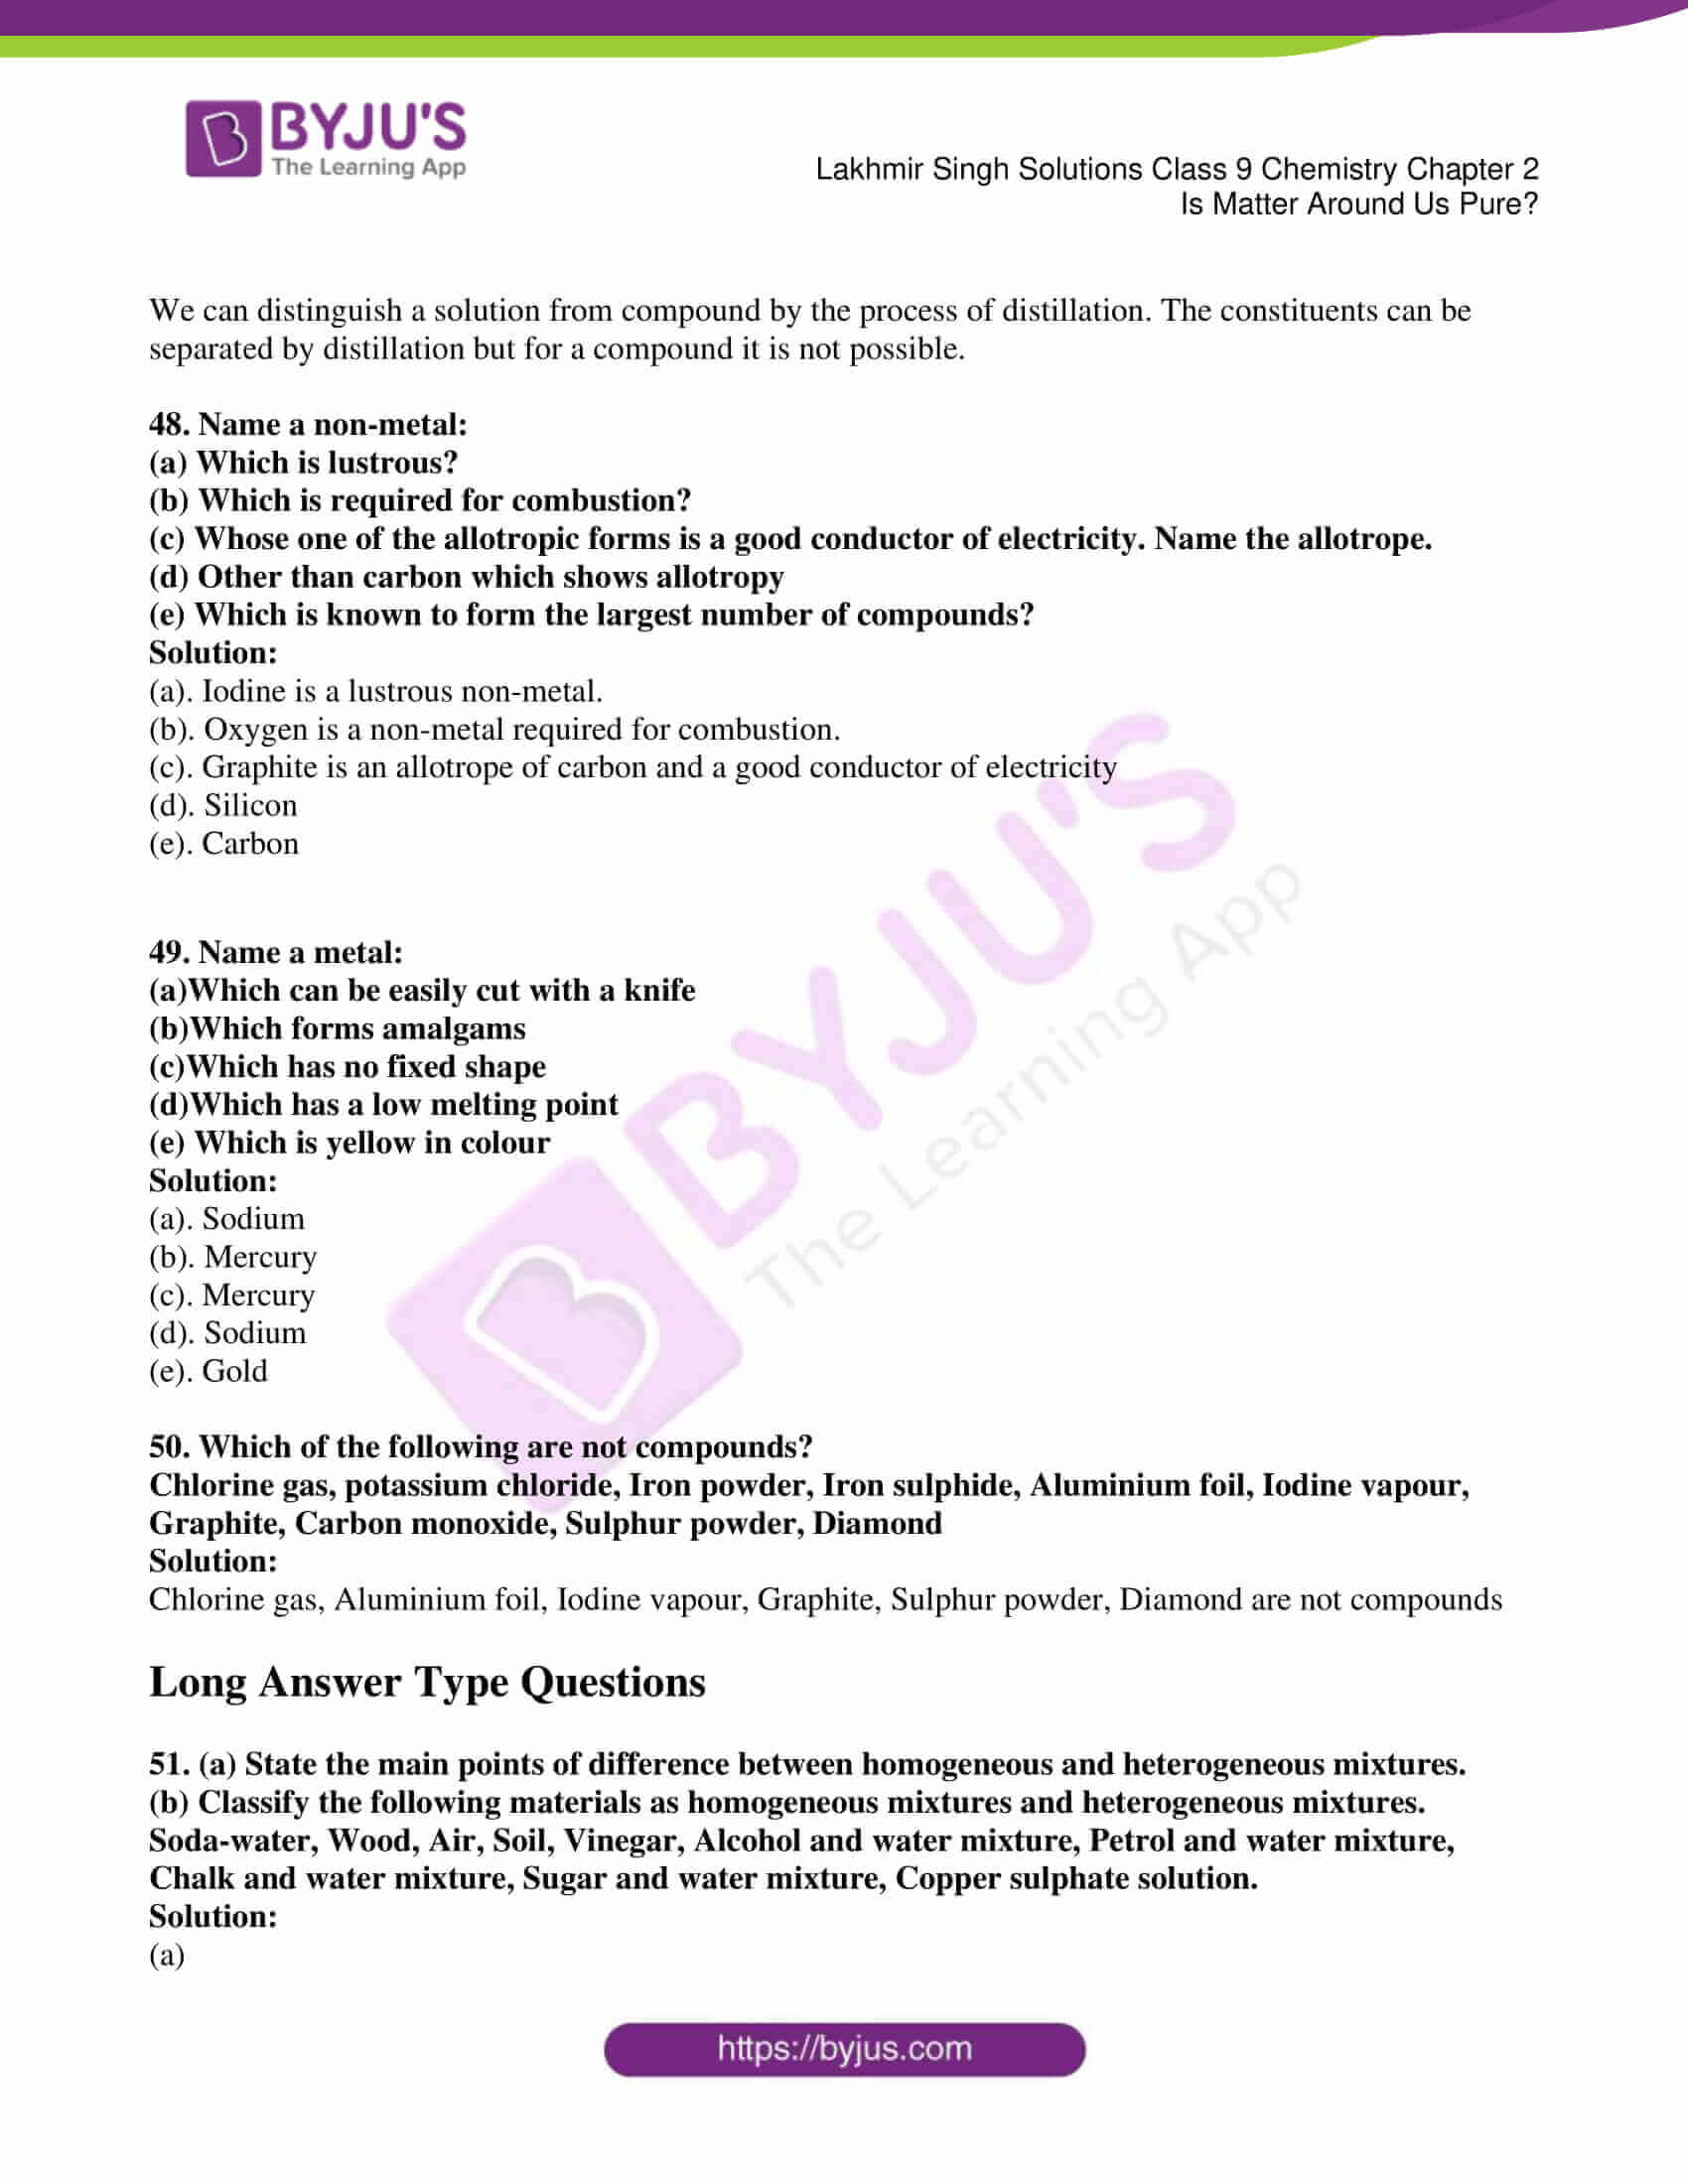 lakhmir singh solutions class 9 chemistry chapter 2 08